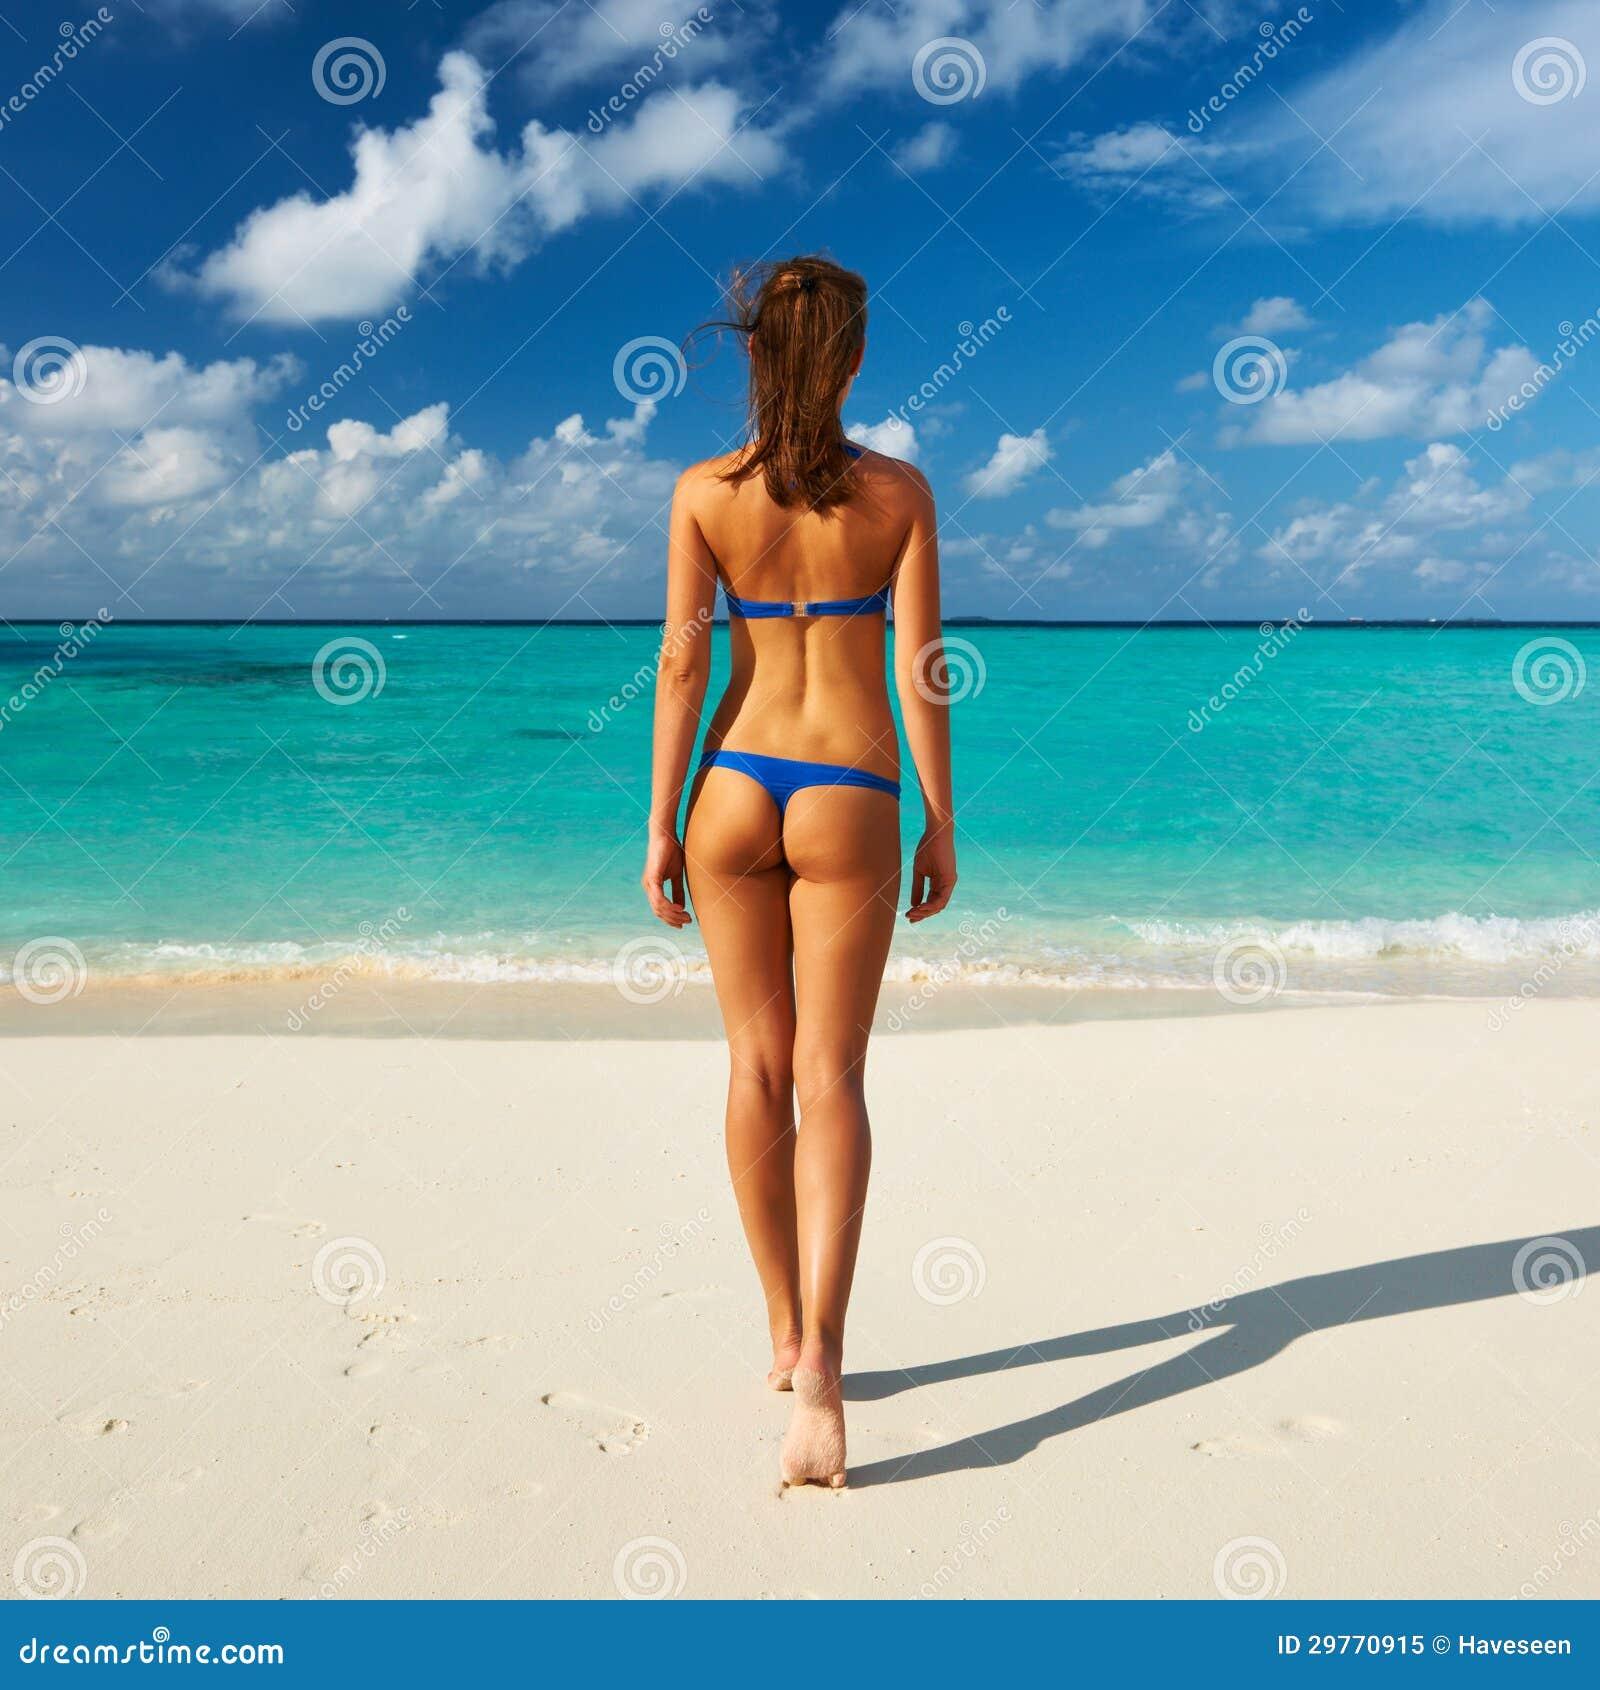 Фото вид сзади на пляже 5 фотография